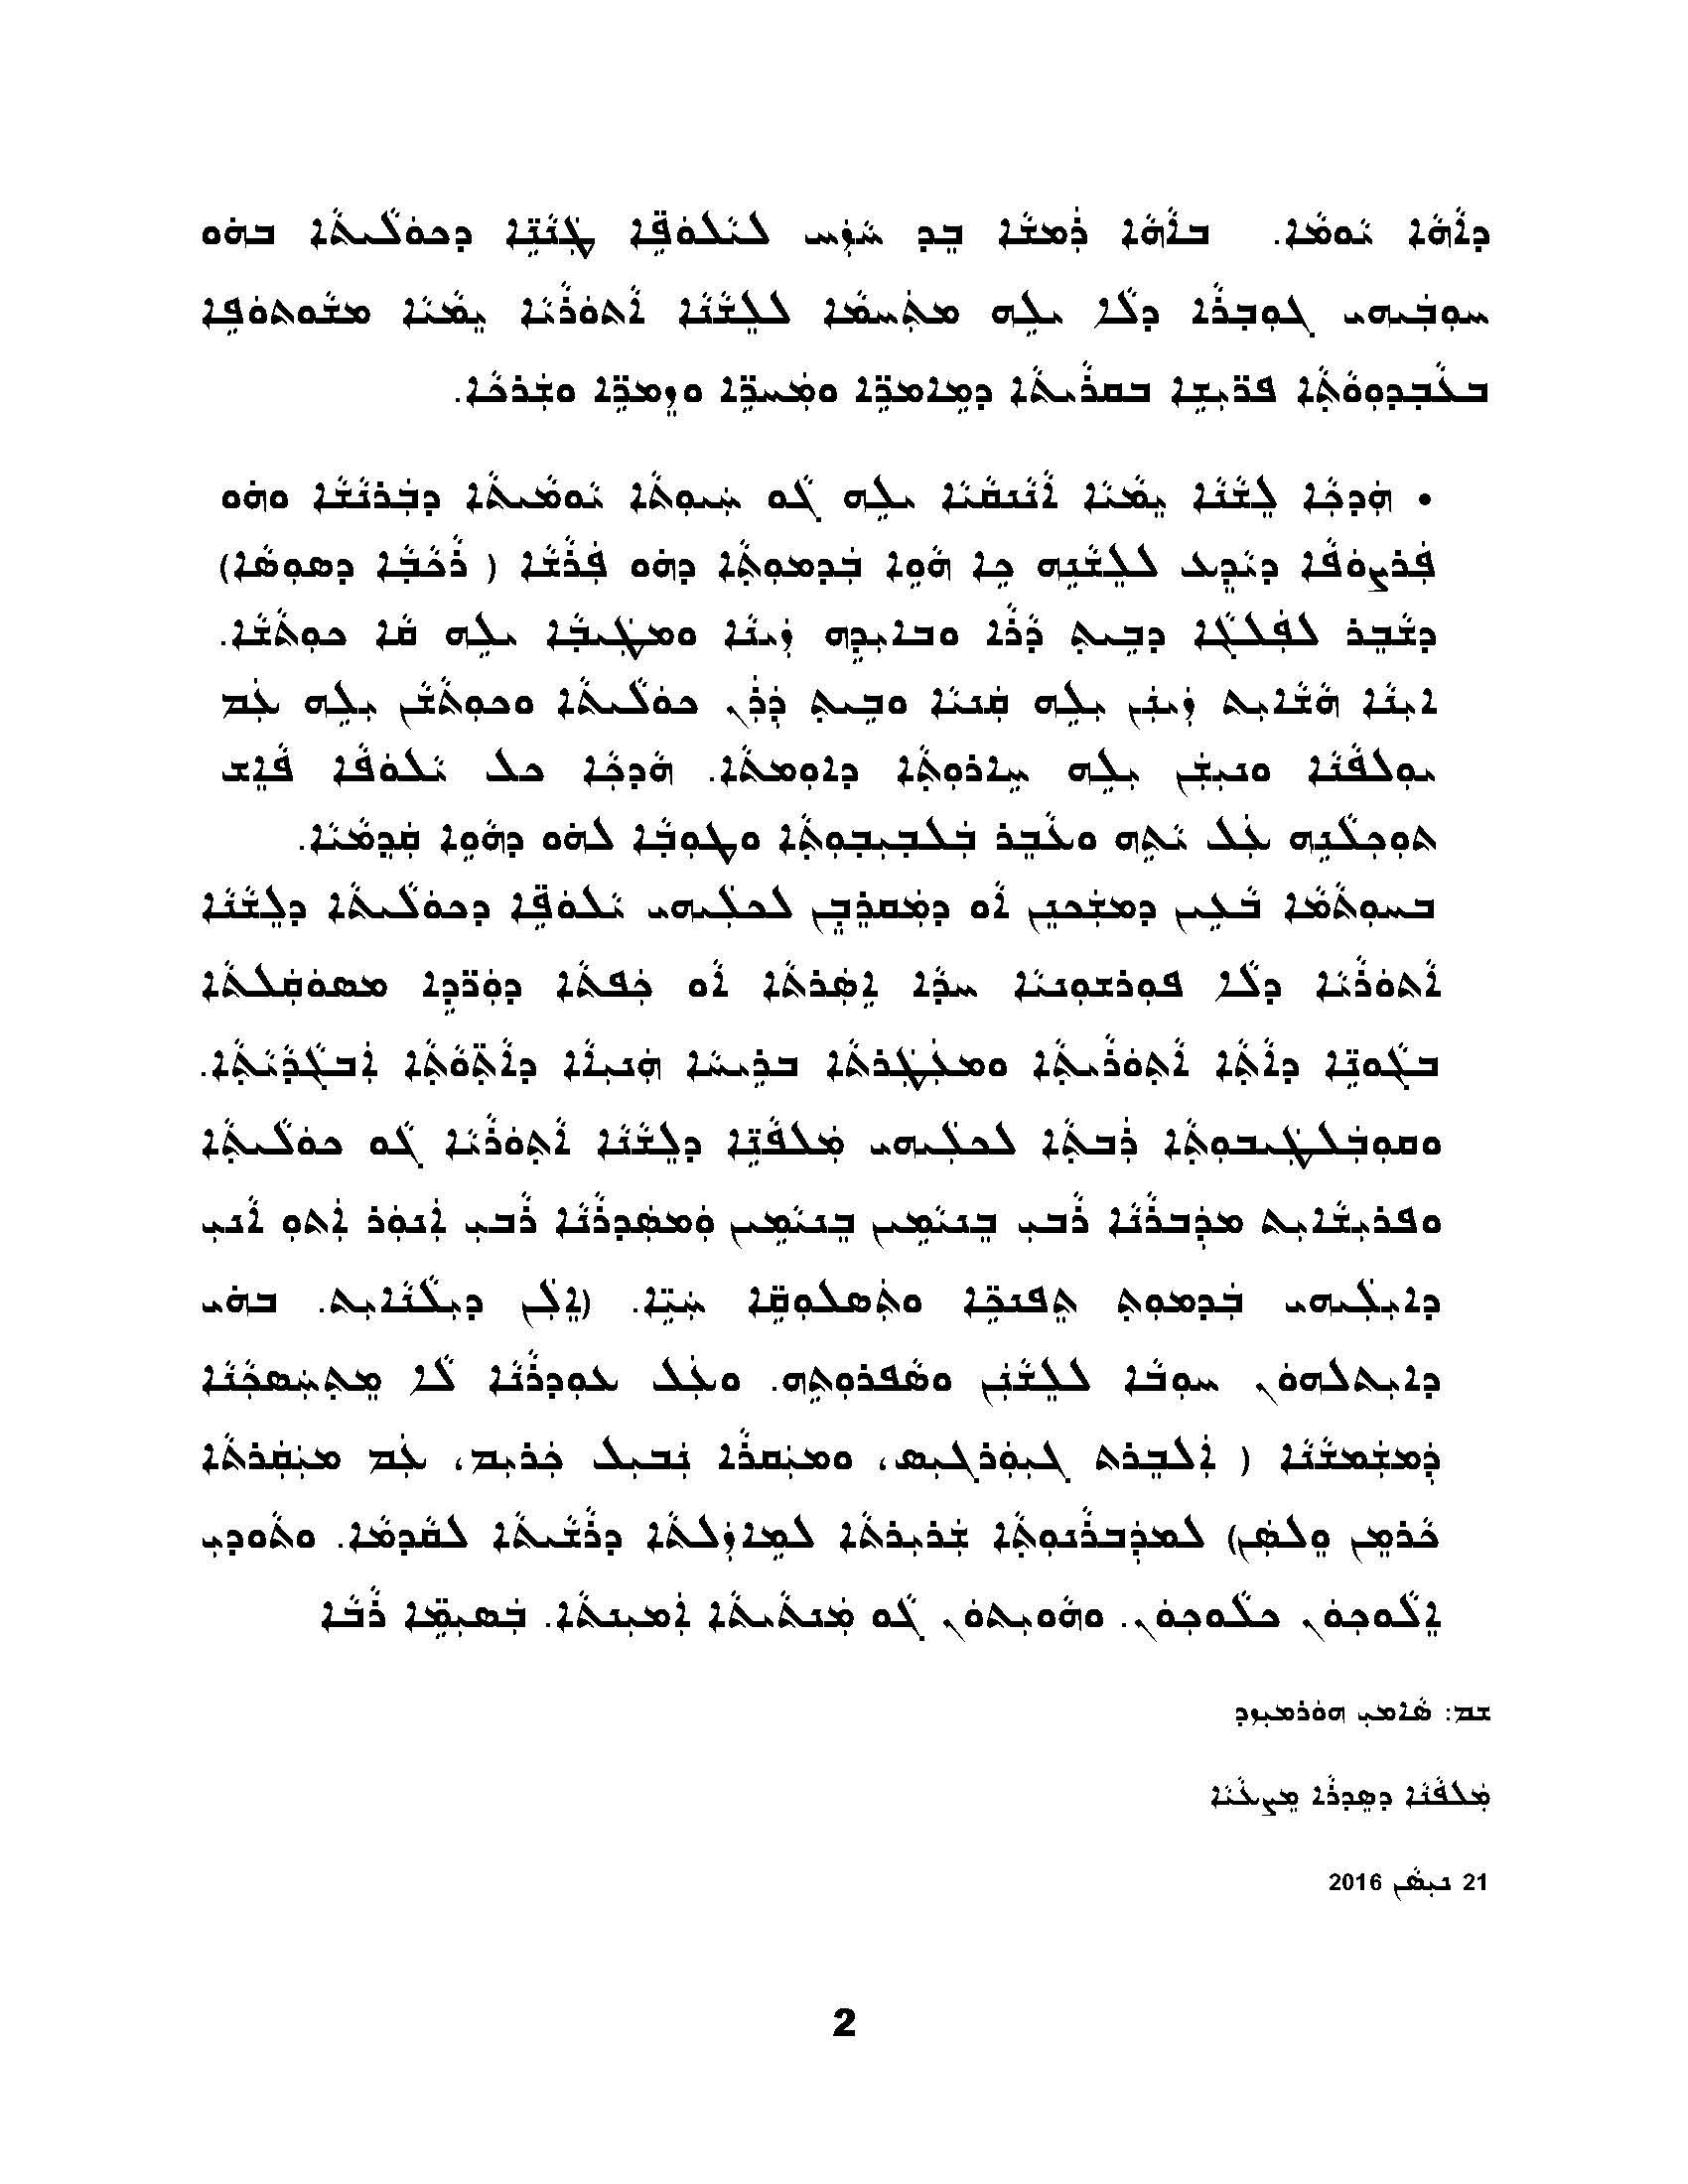 yawma d lishana 2016_Page_2